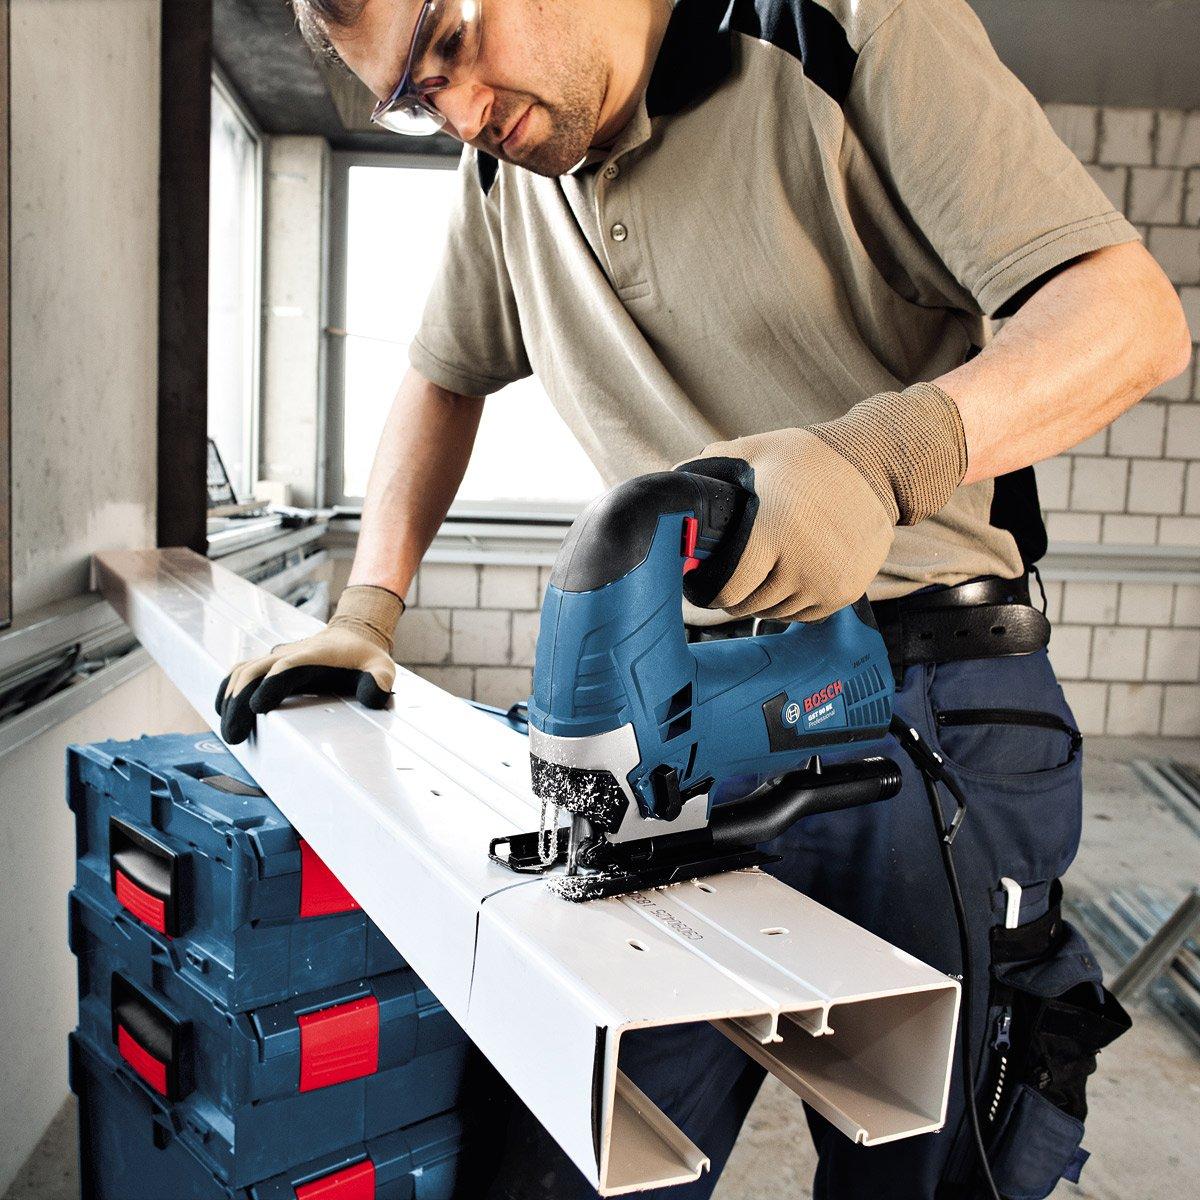 Bosch Professional GST 90 BE Corded 110 V Jigsaw